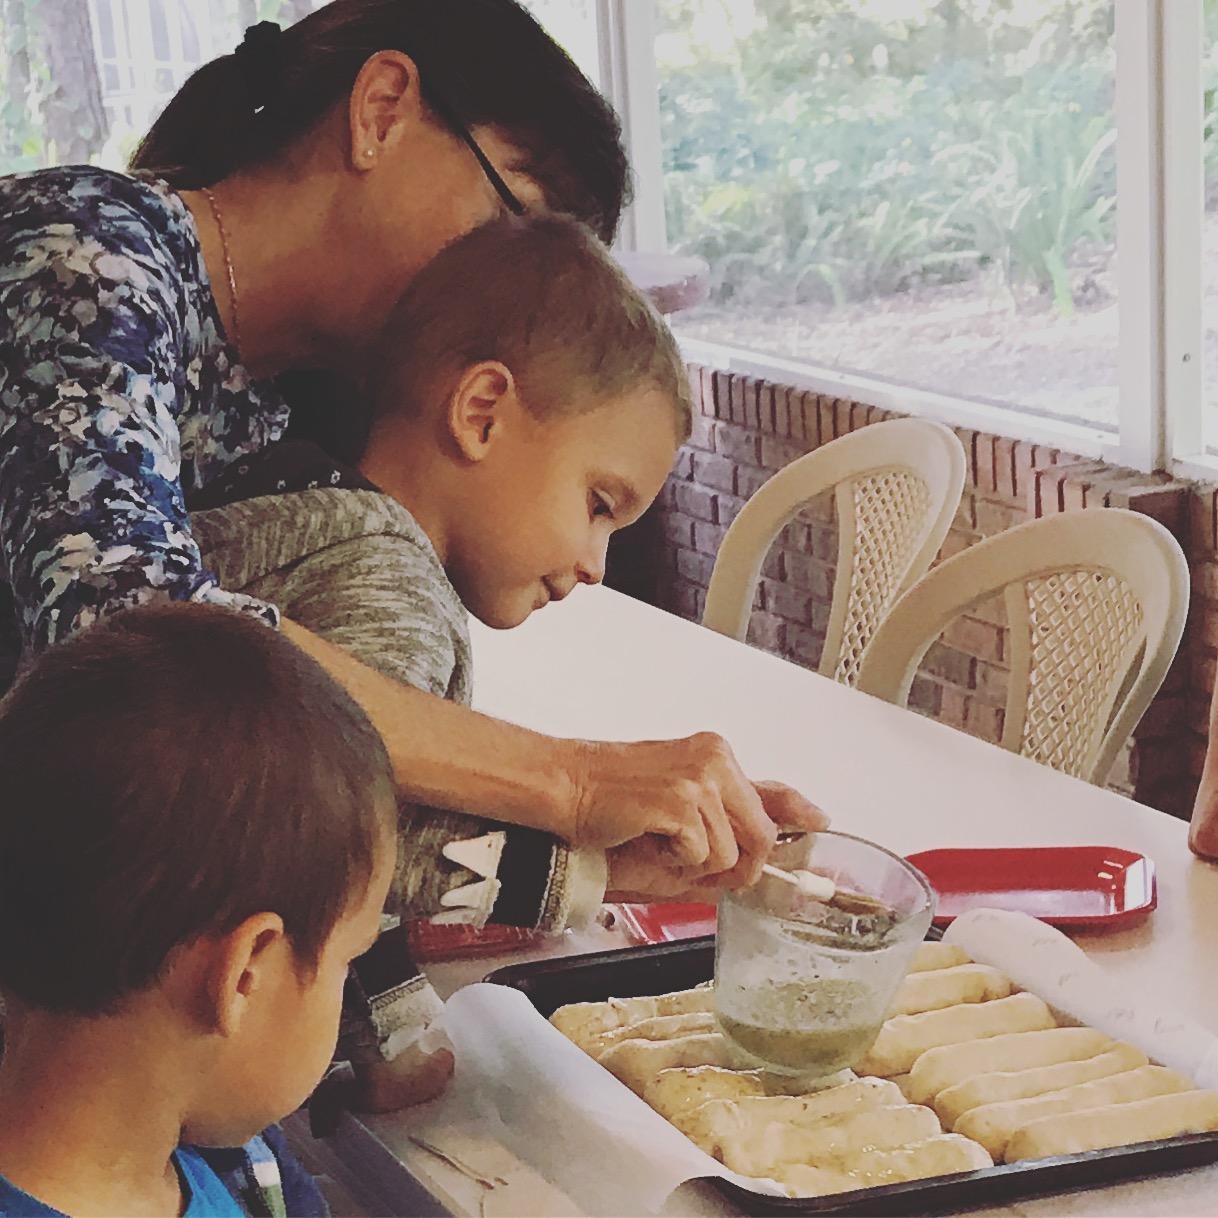 Homeschool Co-Op Day – Pizza Making! 11/4/16